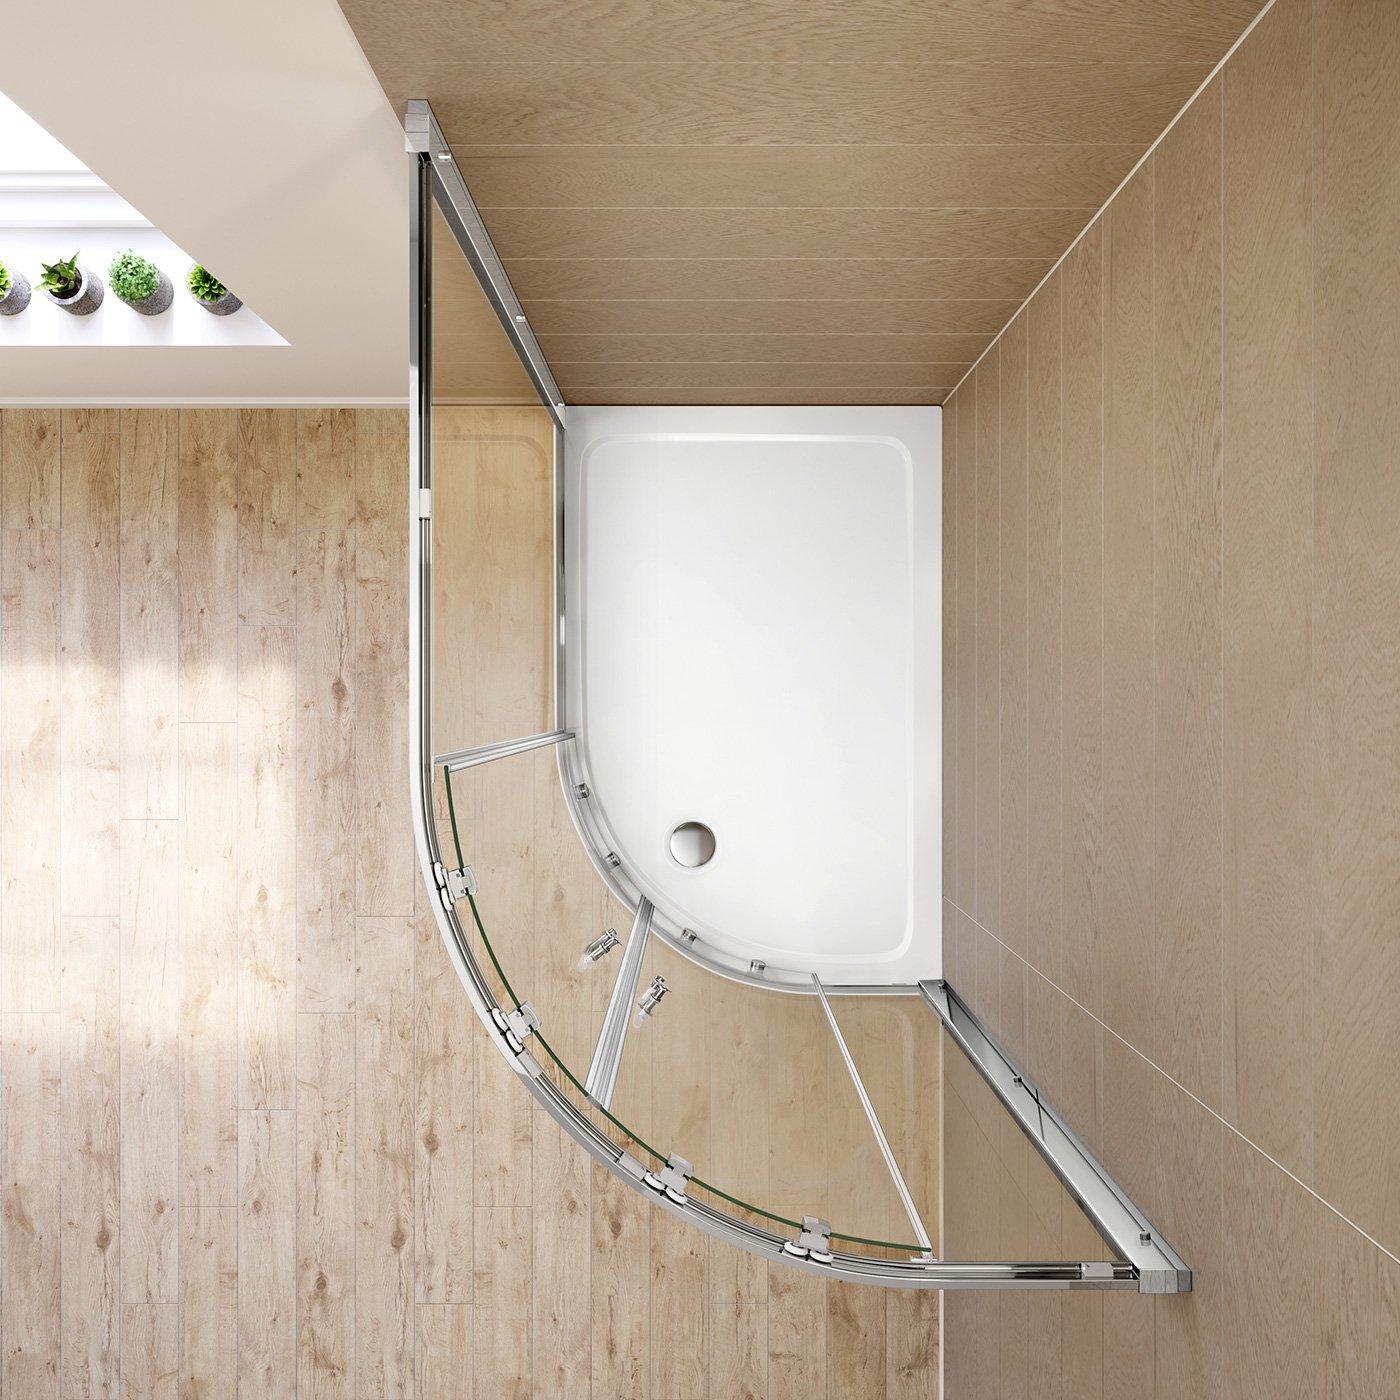 iBathUK 1200 x 800 Quadrant 6mm Thick Sliding Glass Shower Enclosure Reversible Cubicle Door